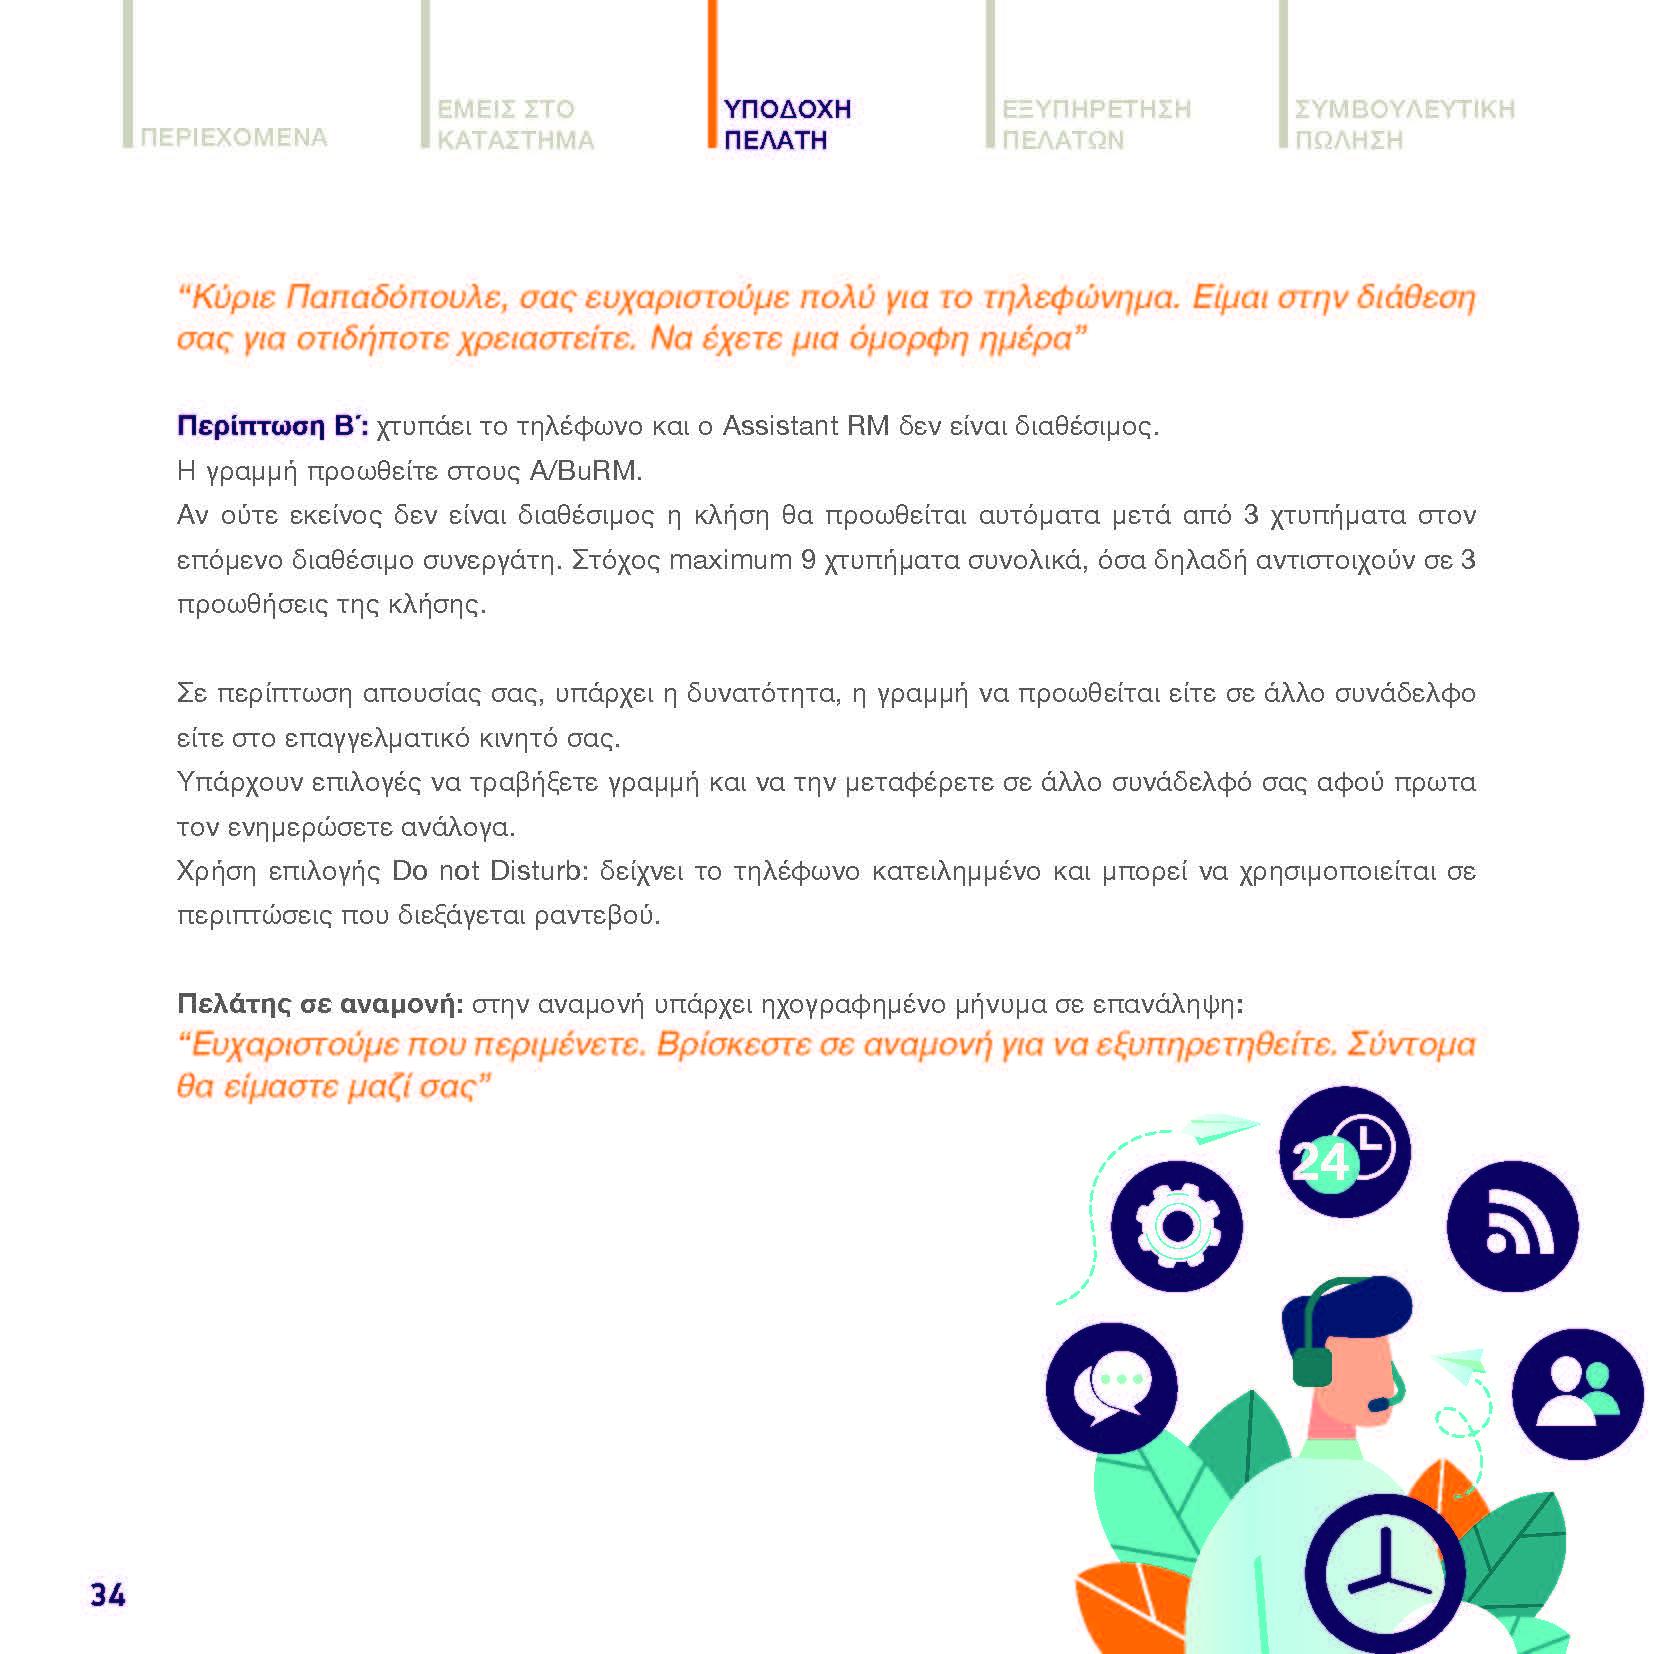 https://www.jib.gr/wp-content/uploads/2020/09/OPTIMA-BANK-BOOKLET-WEB_Page_034.jpg